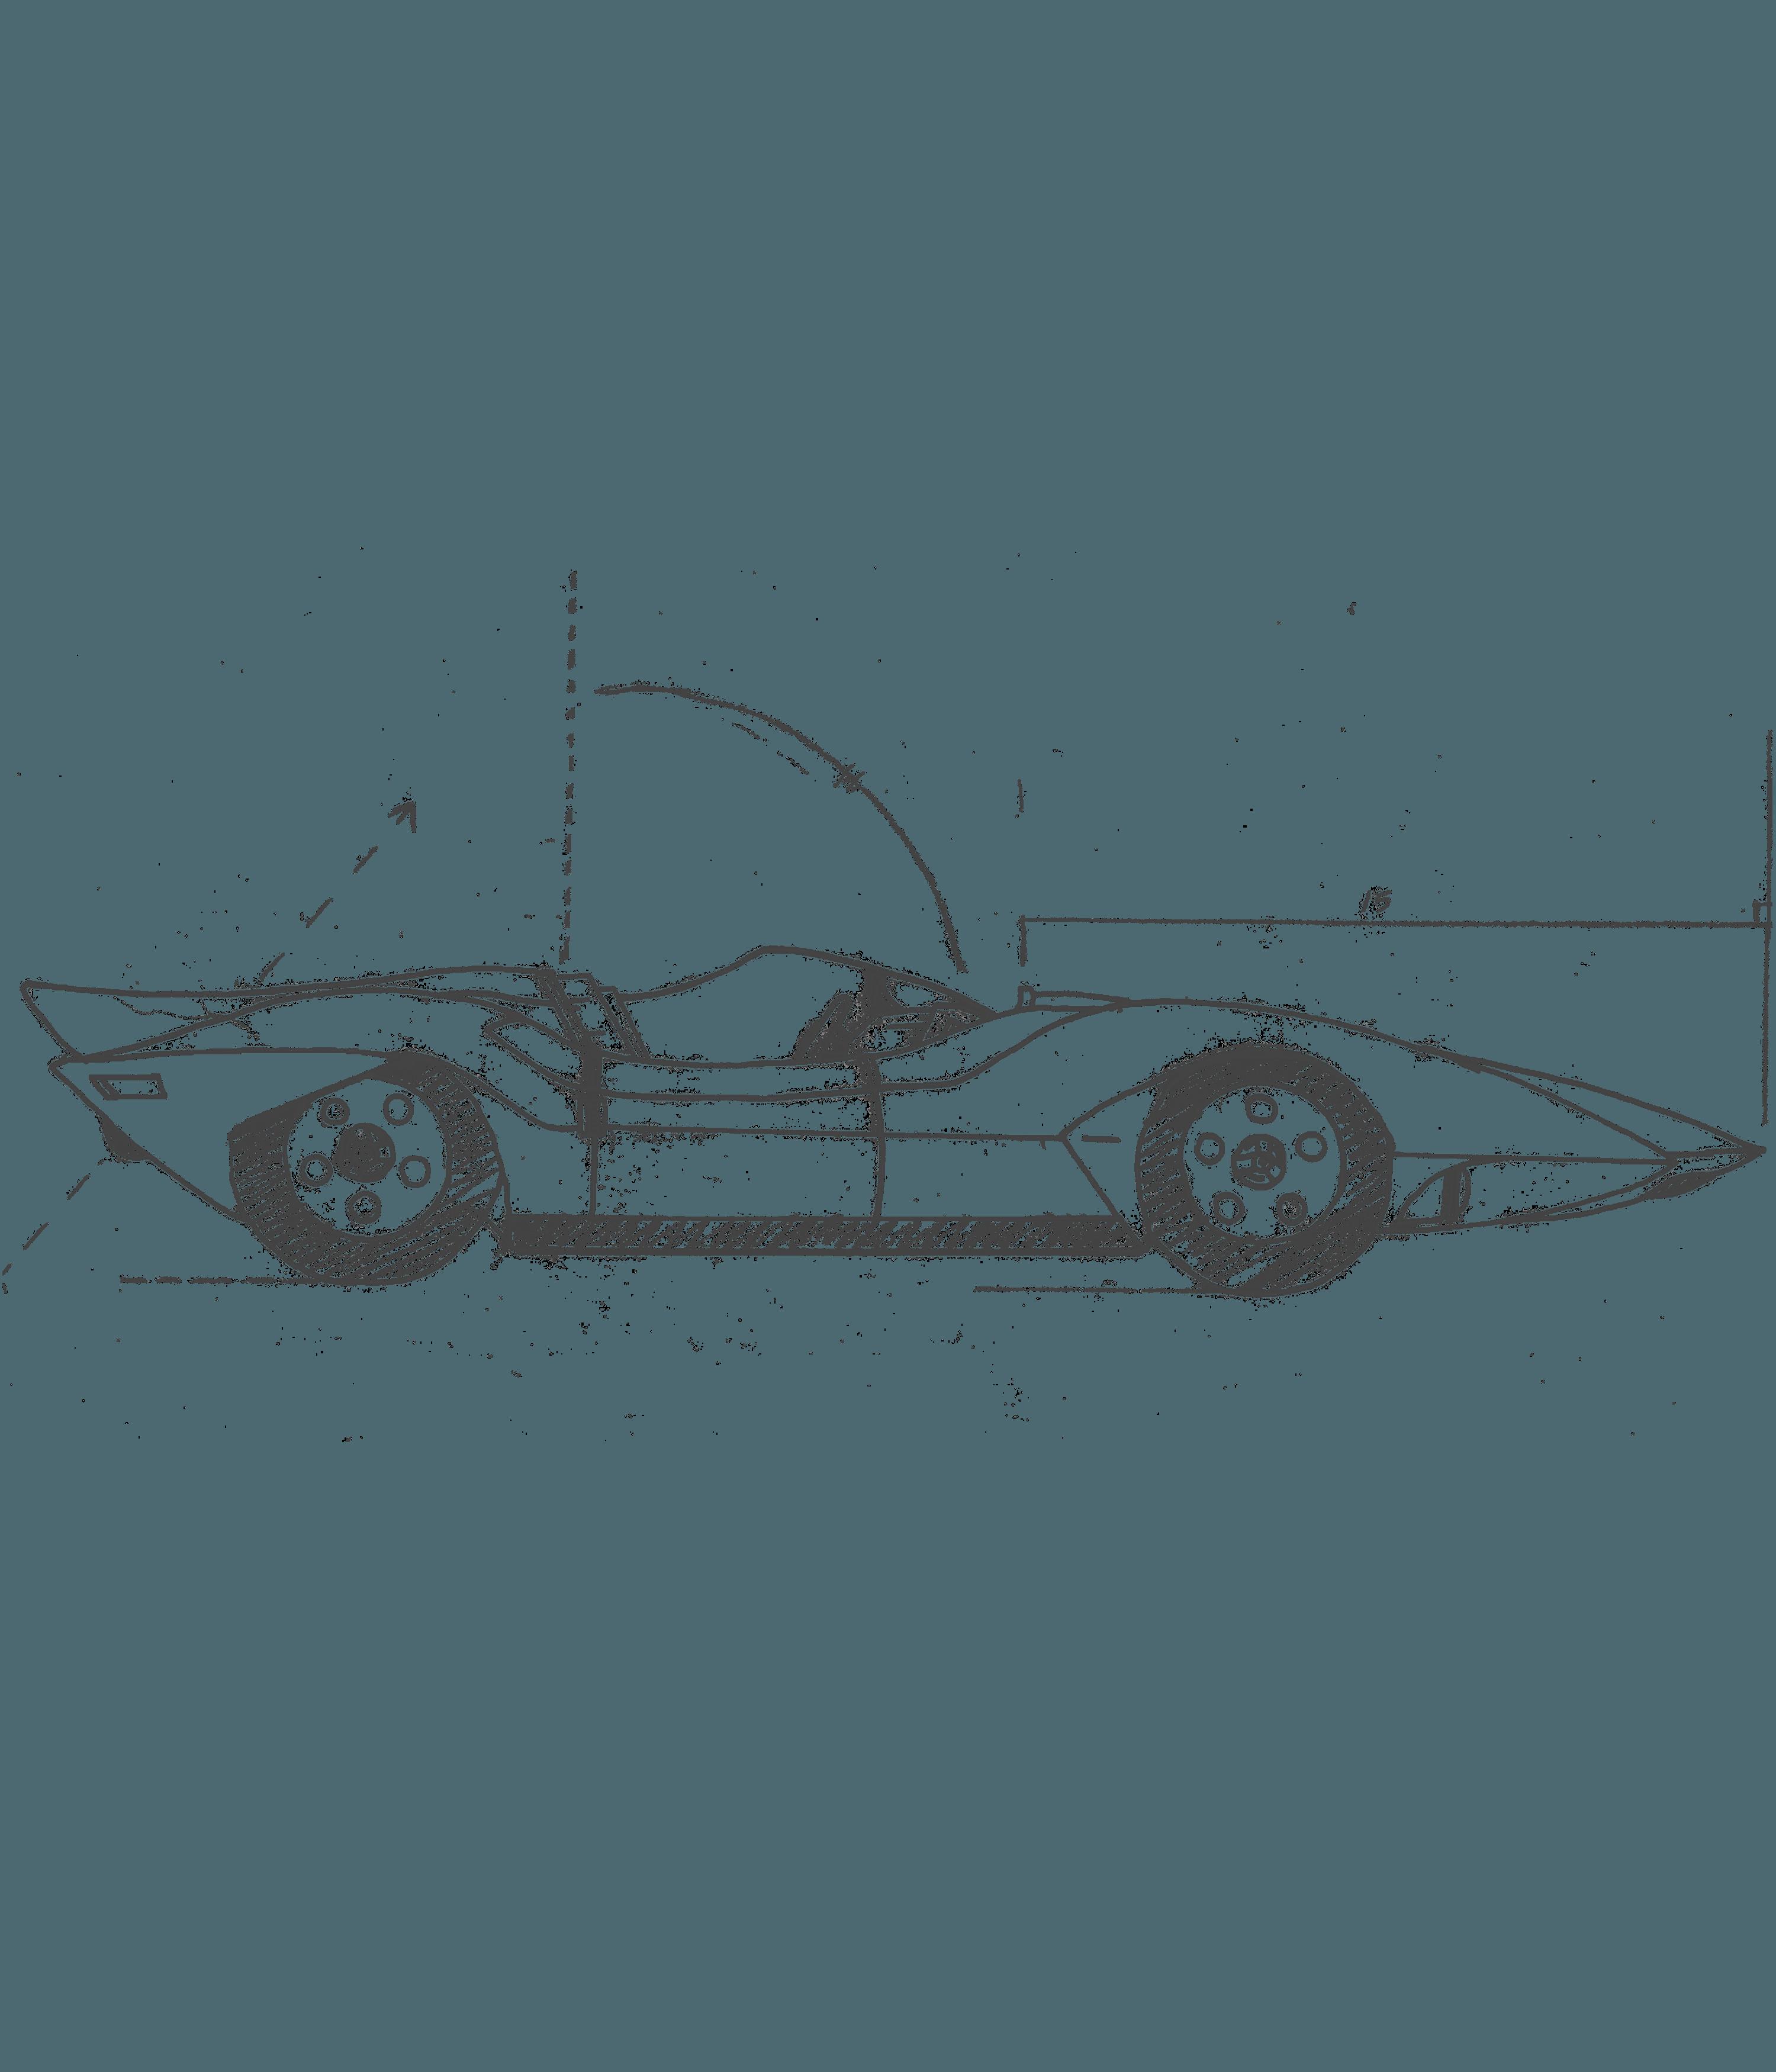 Rocket ship launching illustration